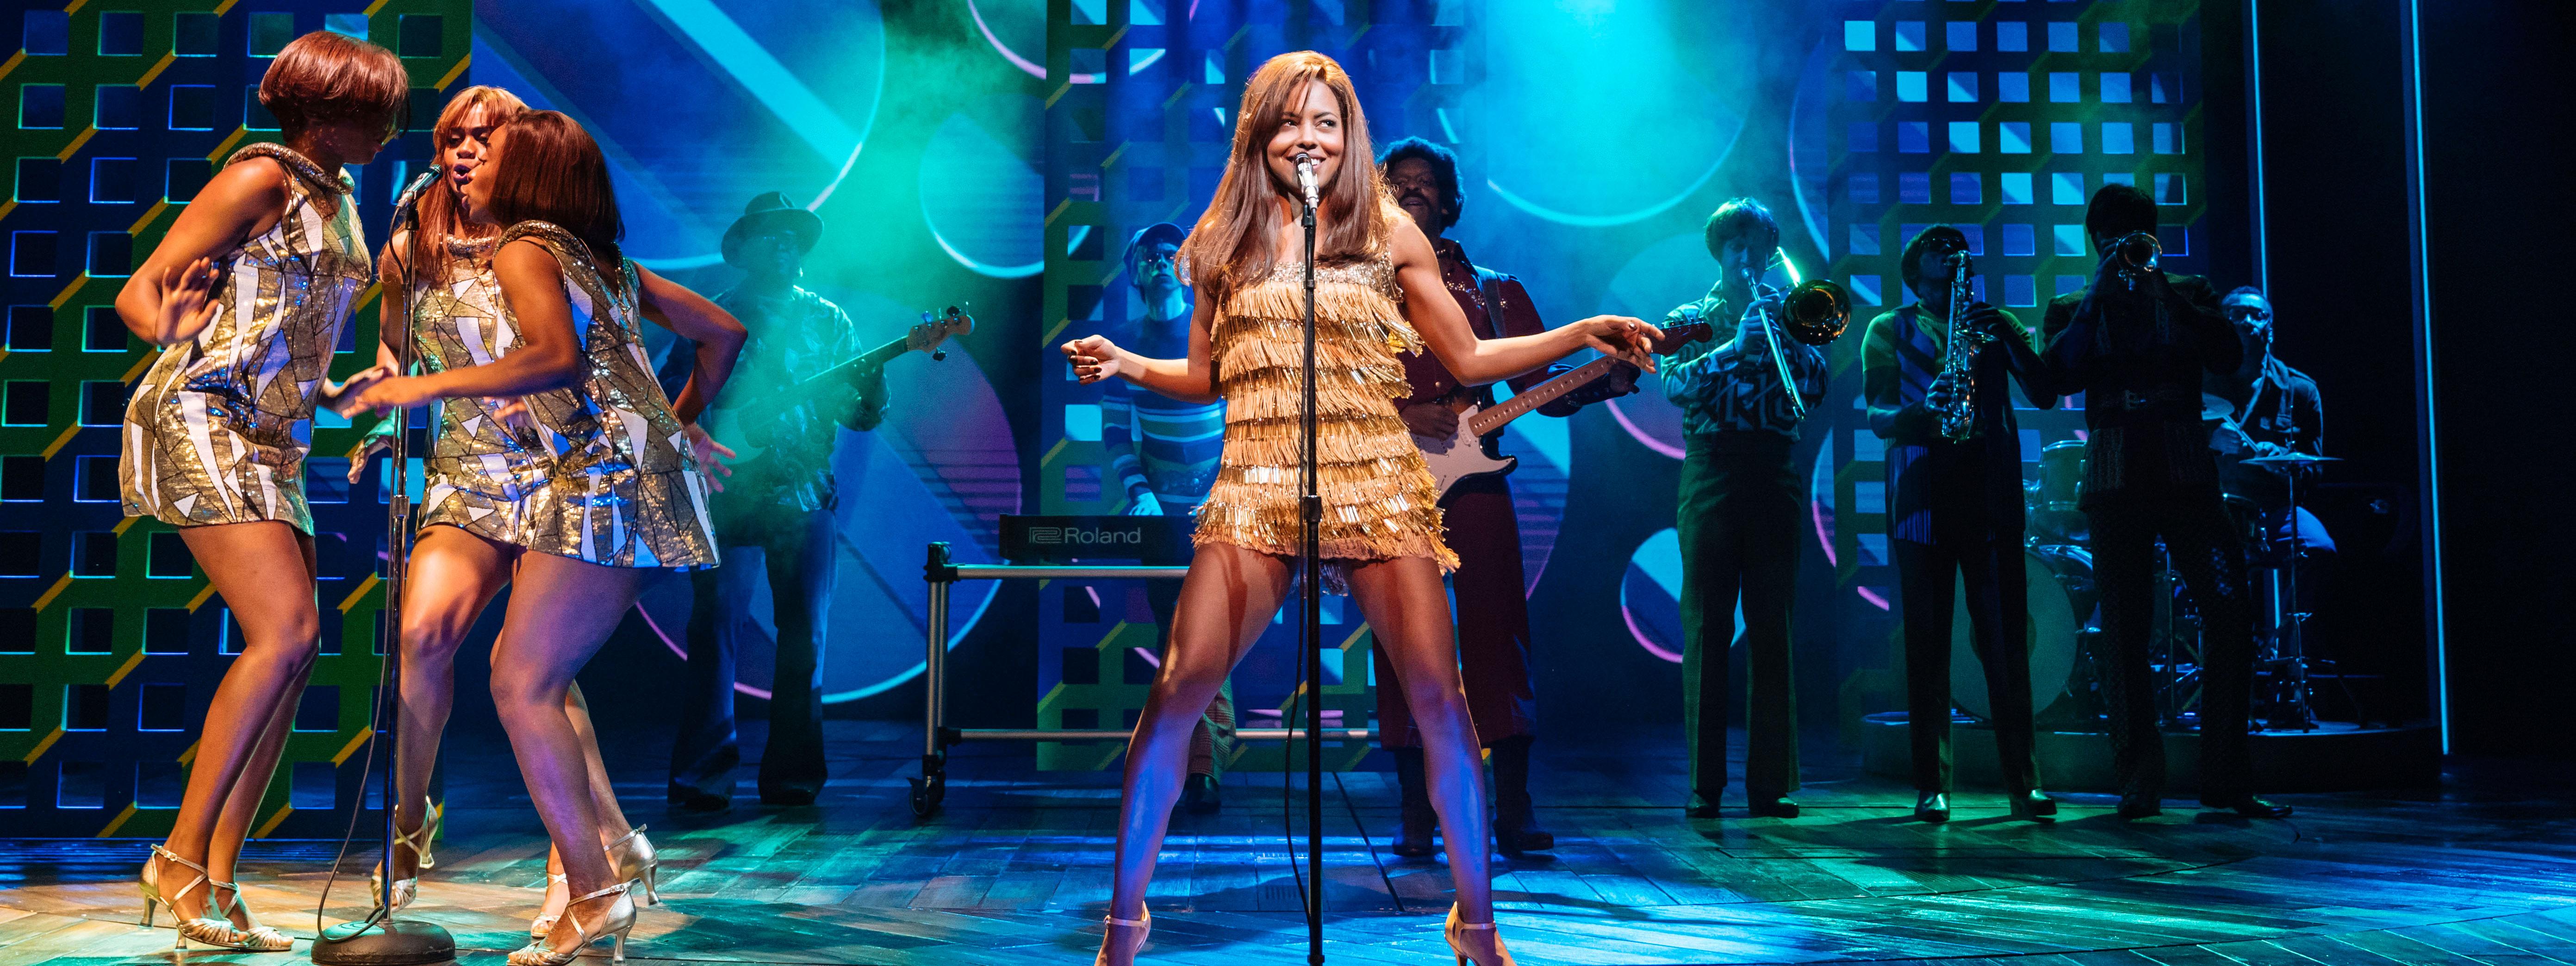 Actress performing as Tina Turner at a musical